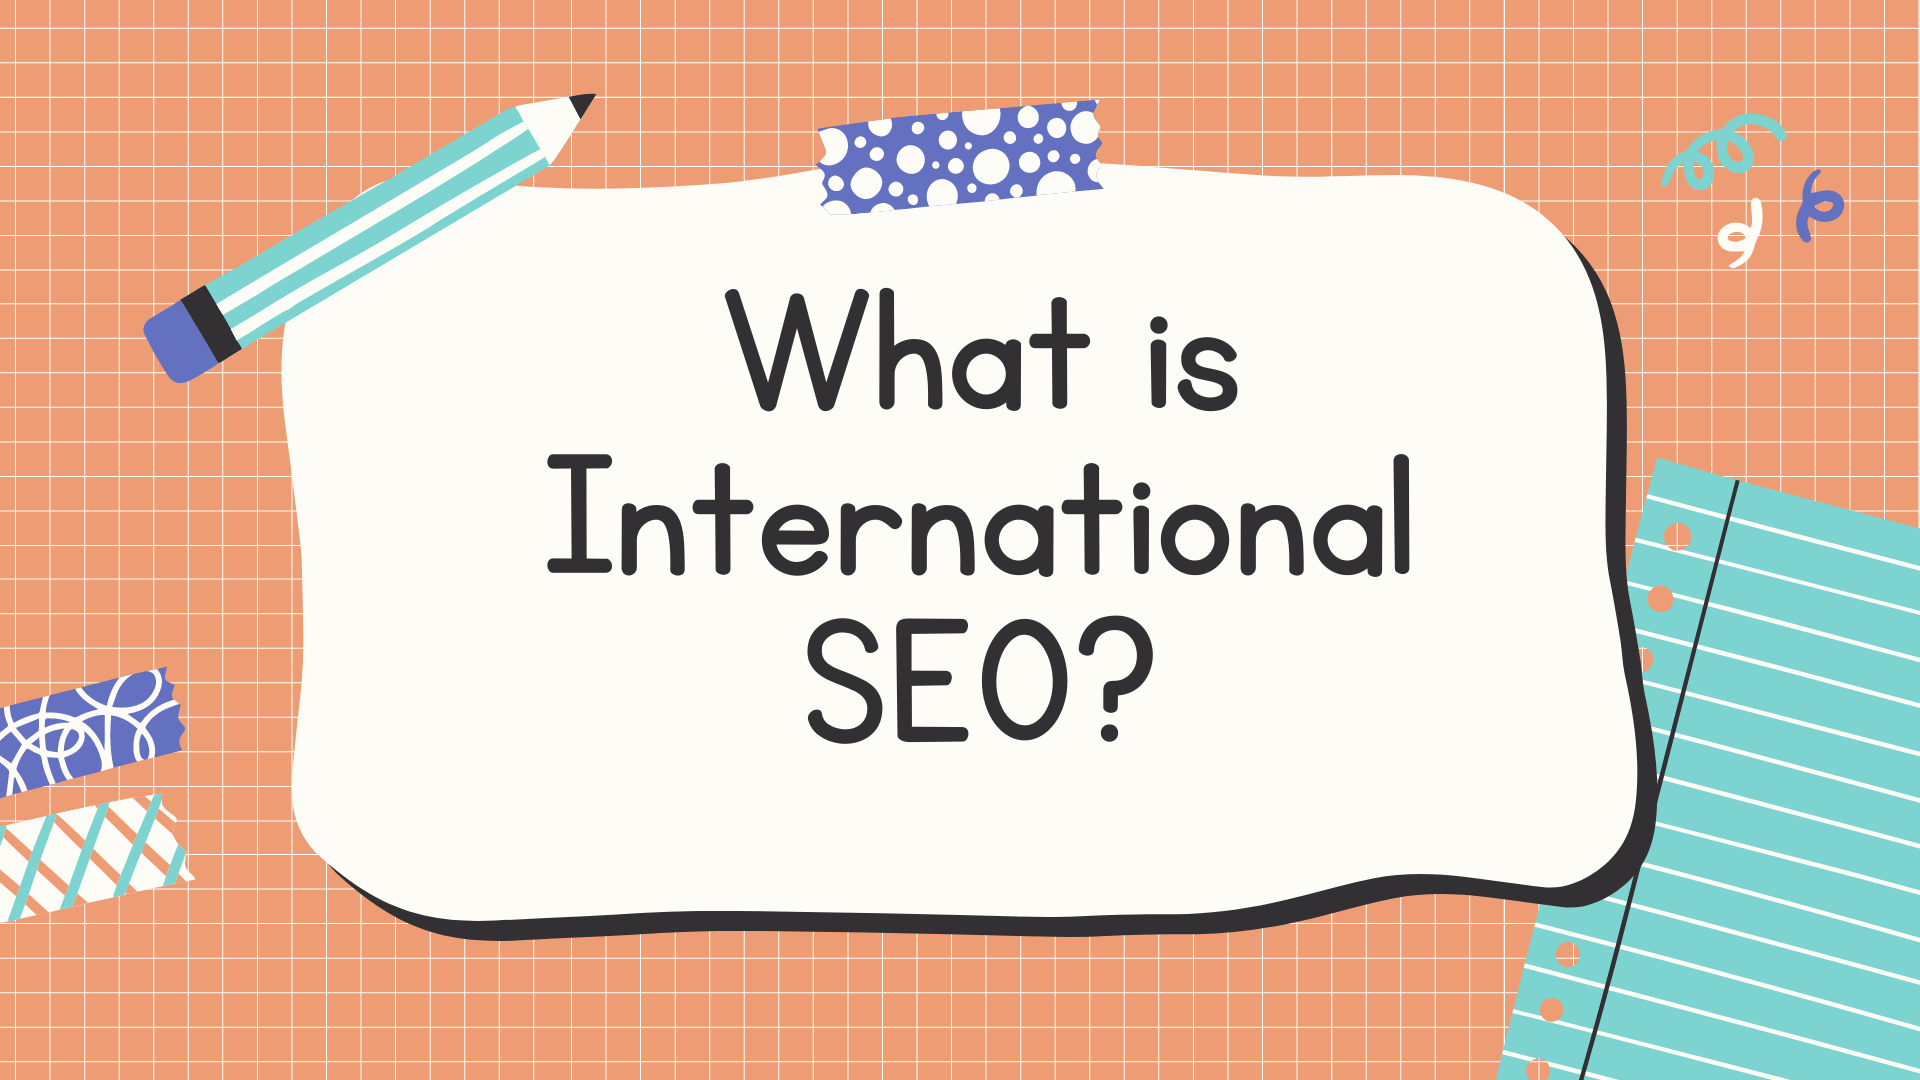 What is International SEO?